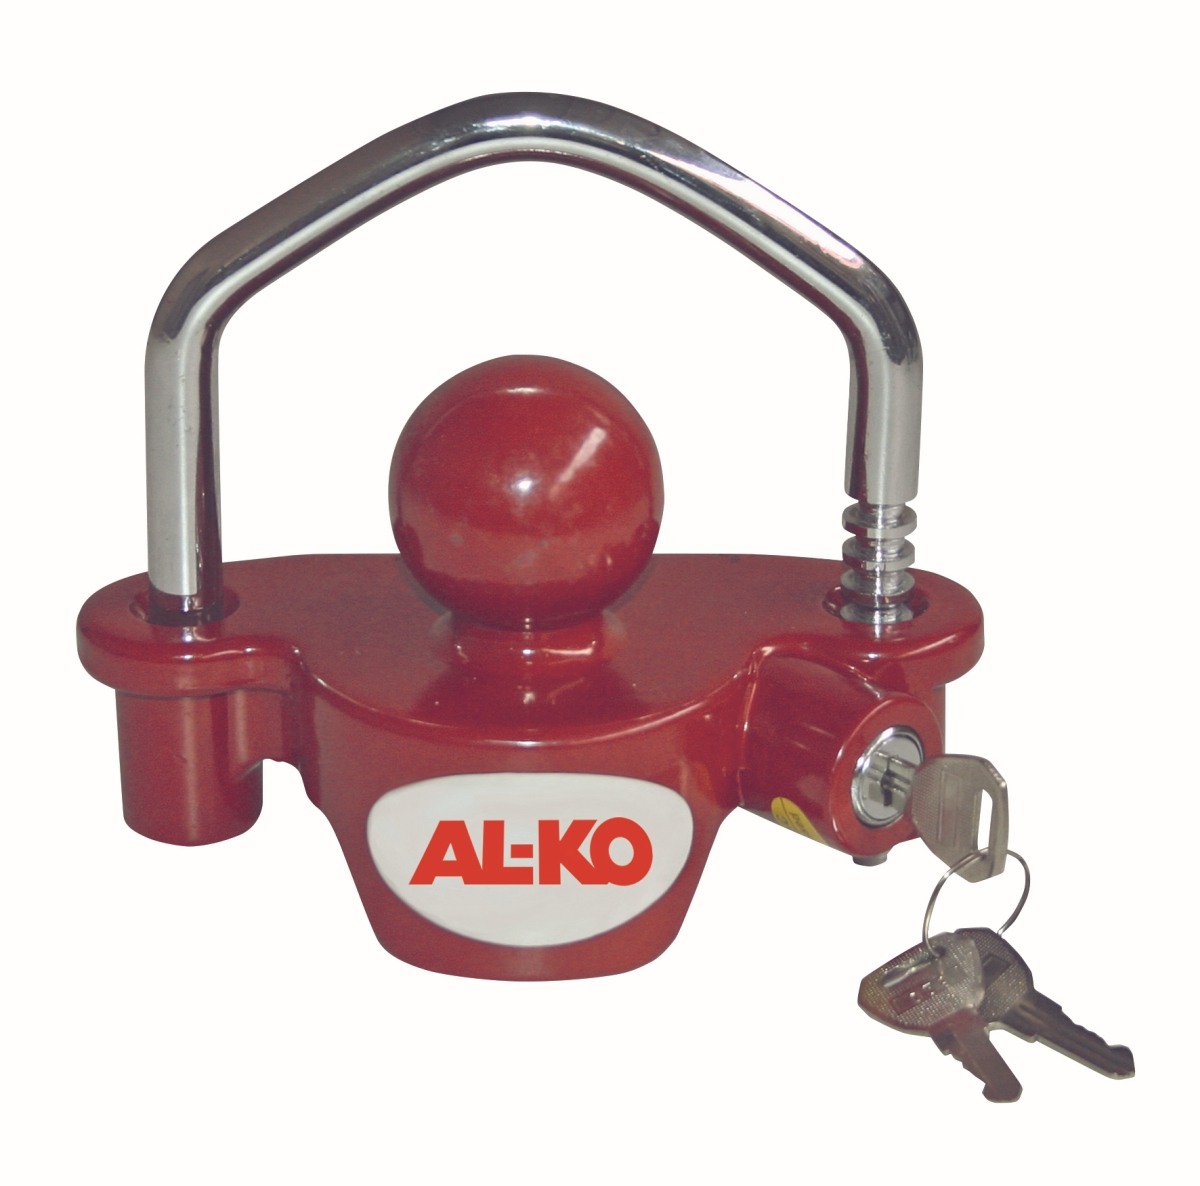 AL-KO Safety Universal Bügelschloss